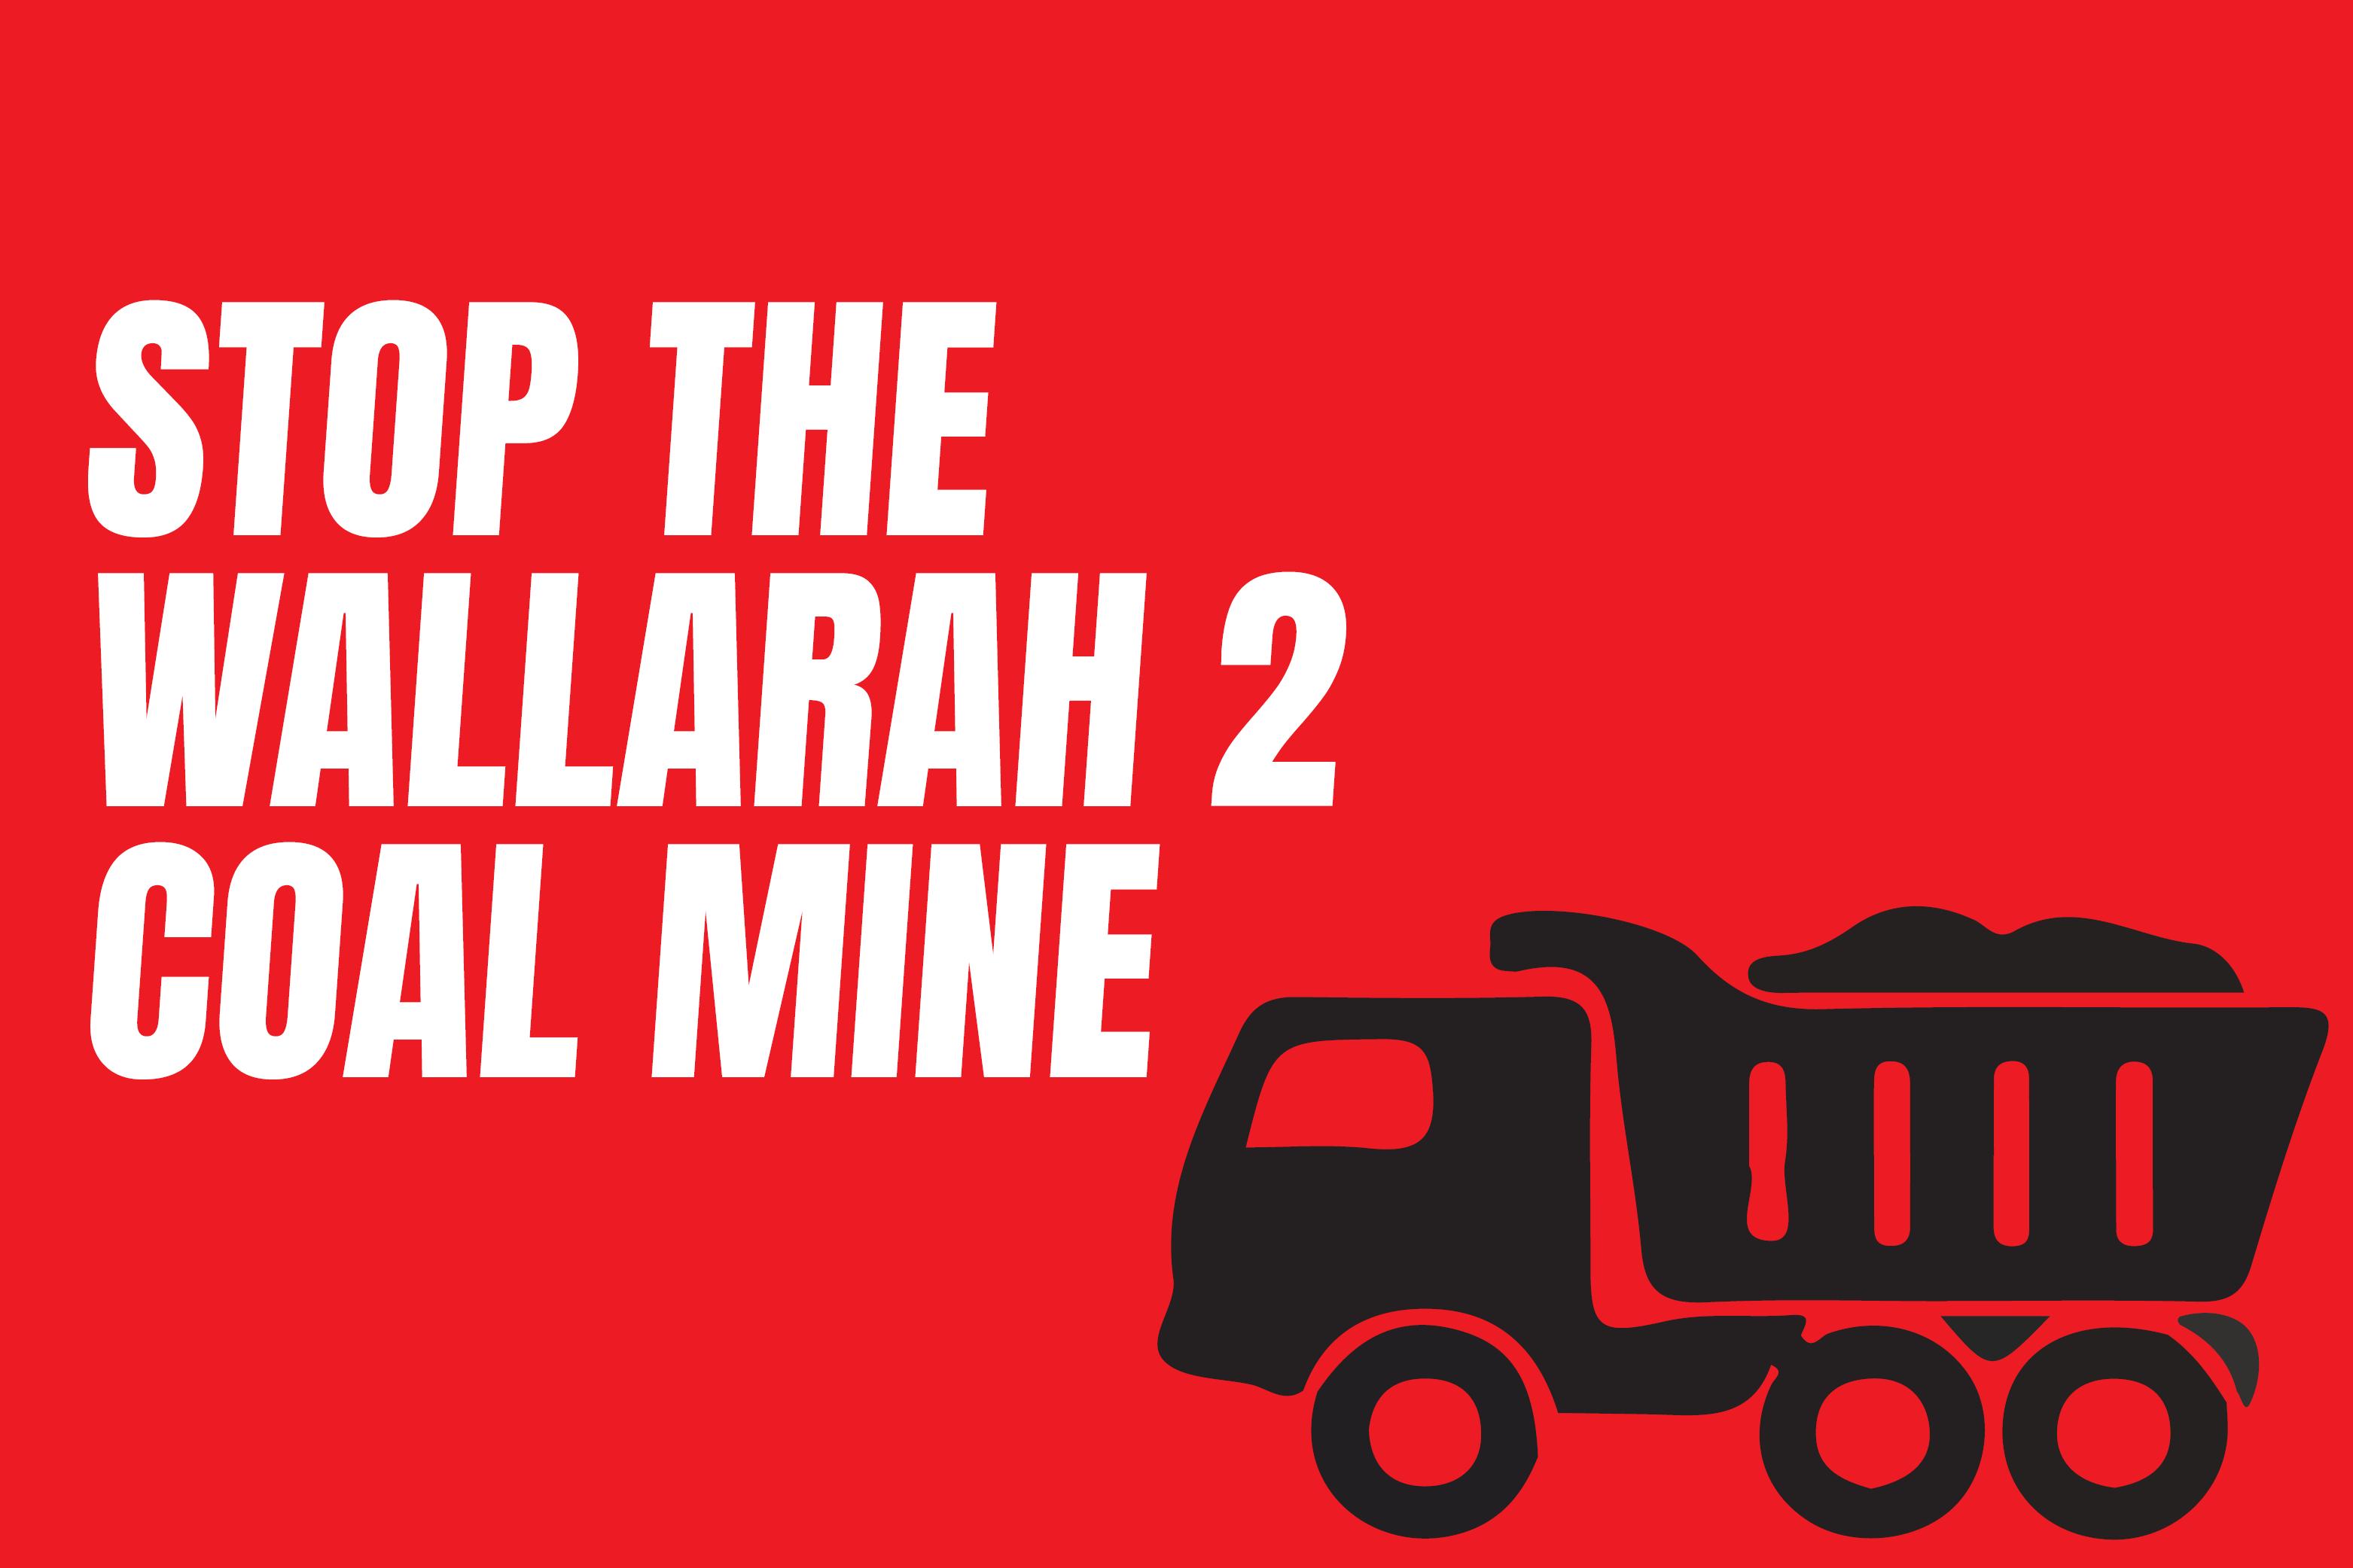 Stop the Wallarah 2 coal mine - Abigail Boyd MP